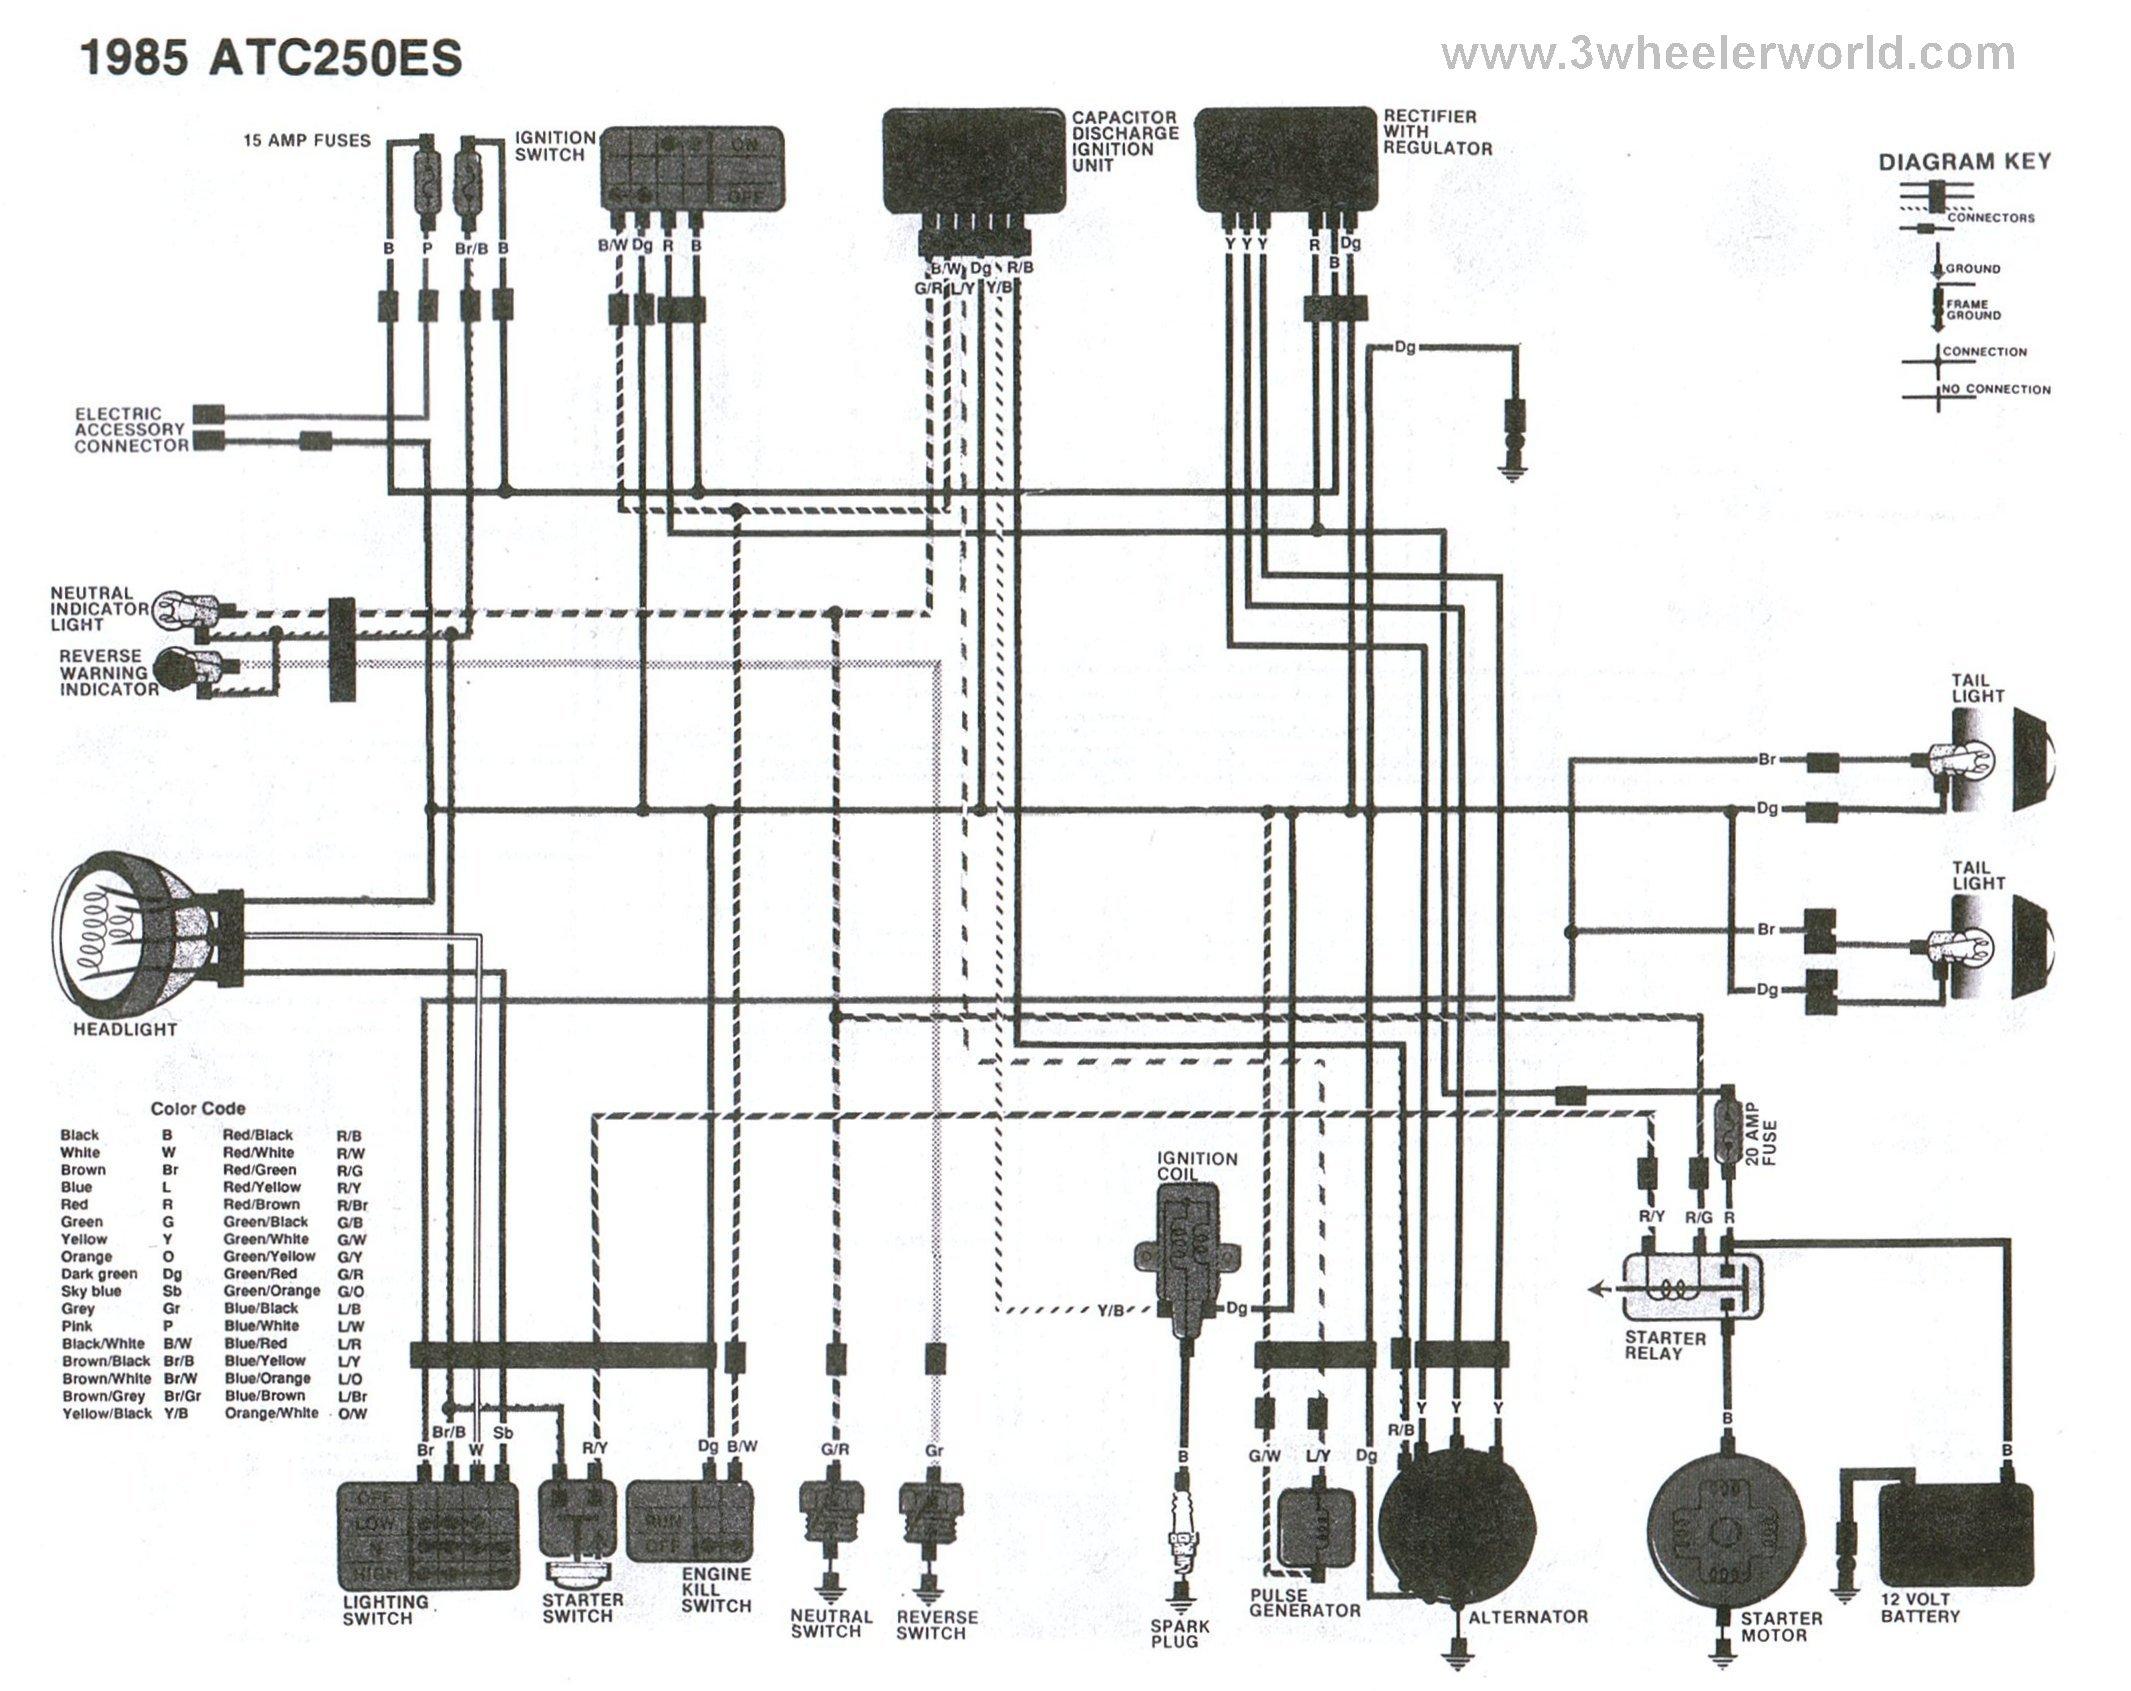 DH_8306] Wiring Diagram For 1986 Honda Trx 250 Free Diagram | Trx 250r Wiring Schematic |  | Ical Ixtu Lukep Terch Itive Kargi Boapu Mohammedshrine Librar Wiring 101